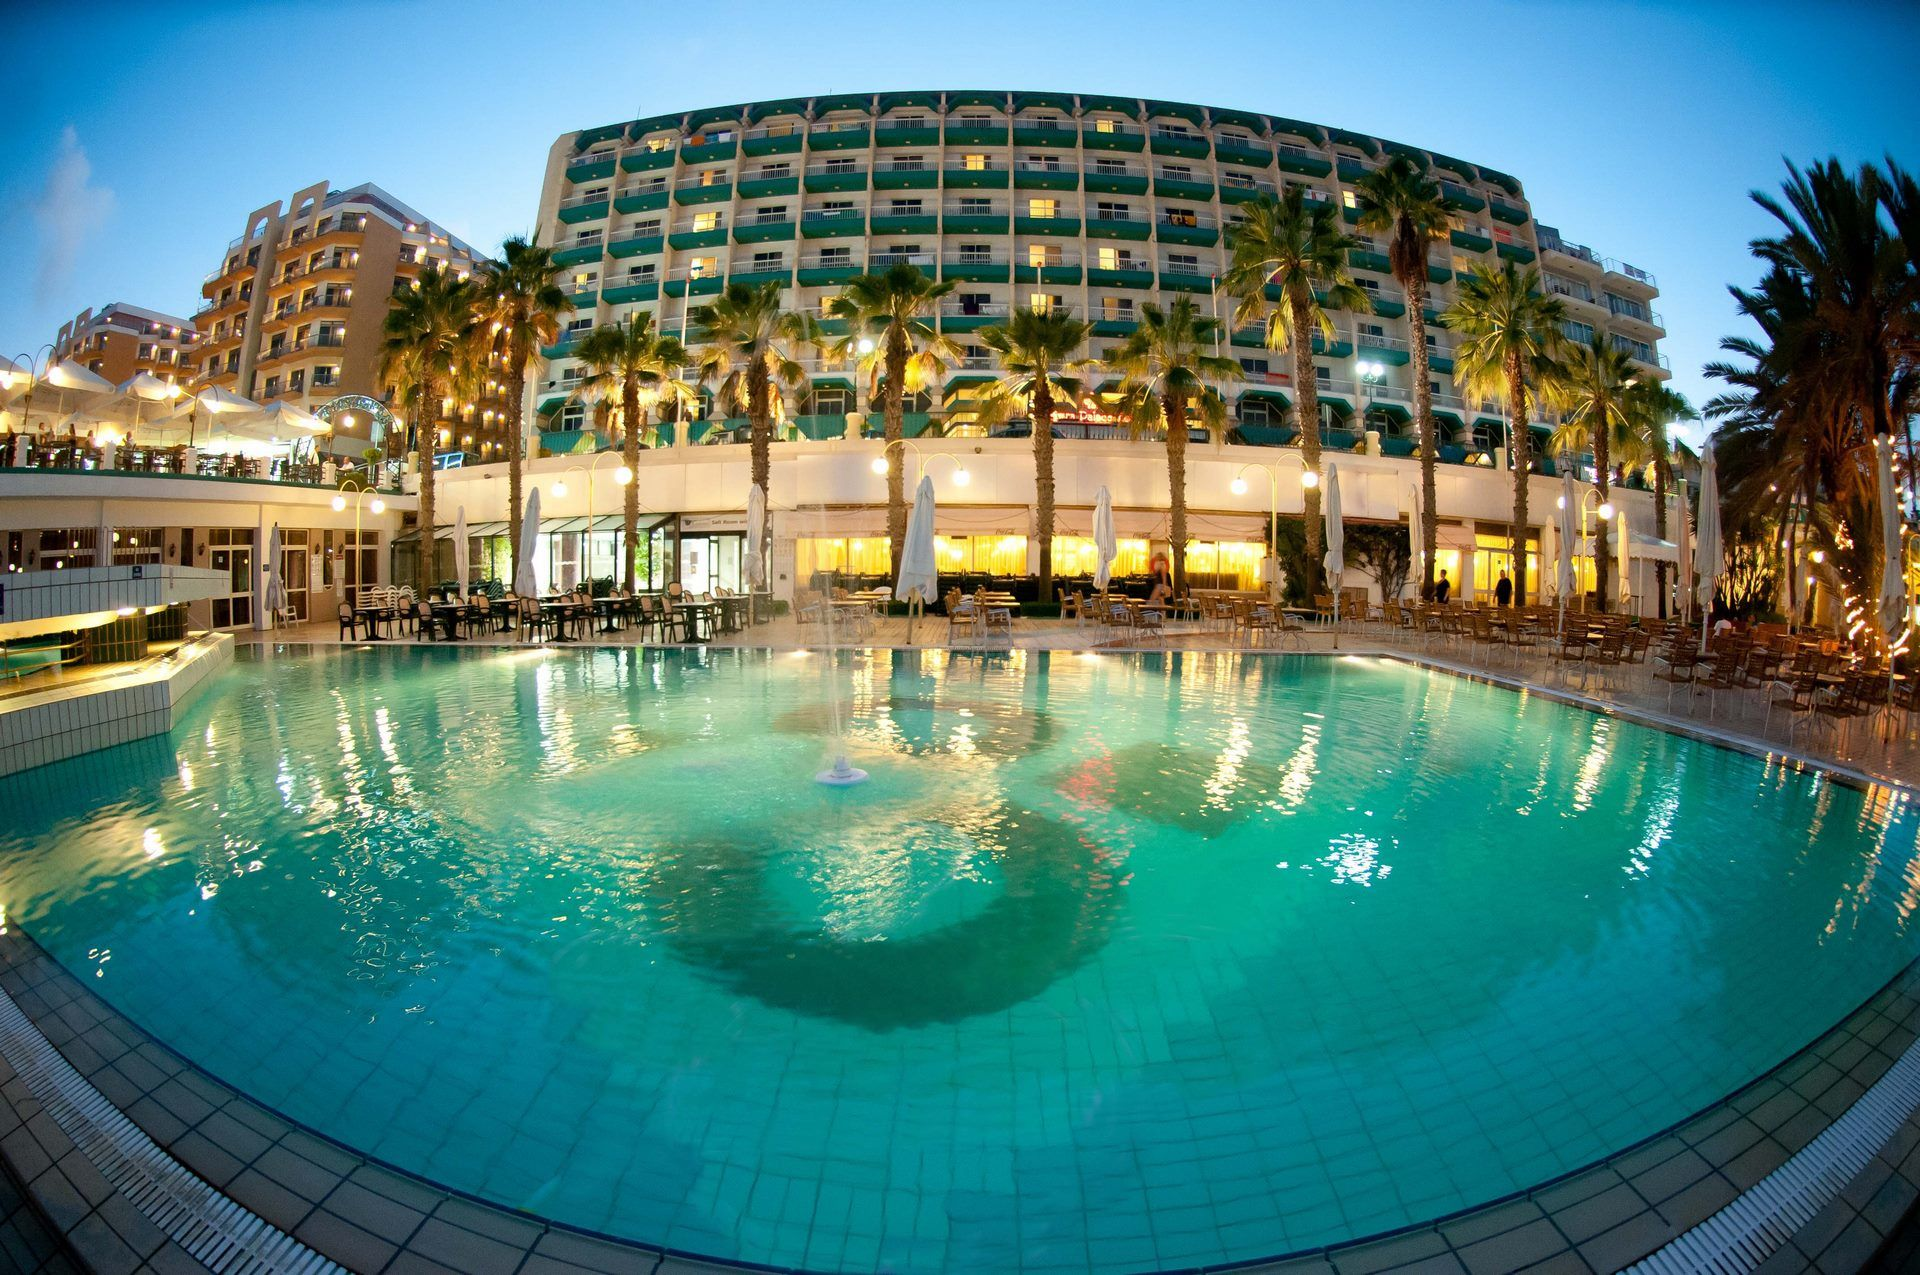 QAWRA PALACE HOTEL - 4 *(nl)